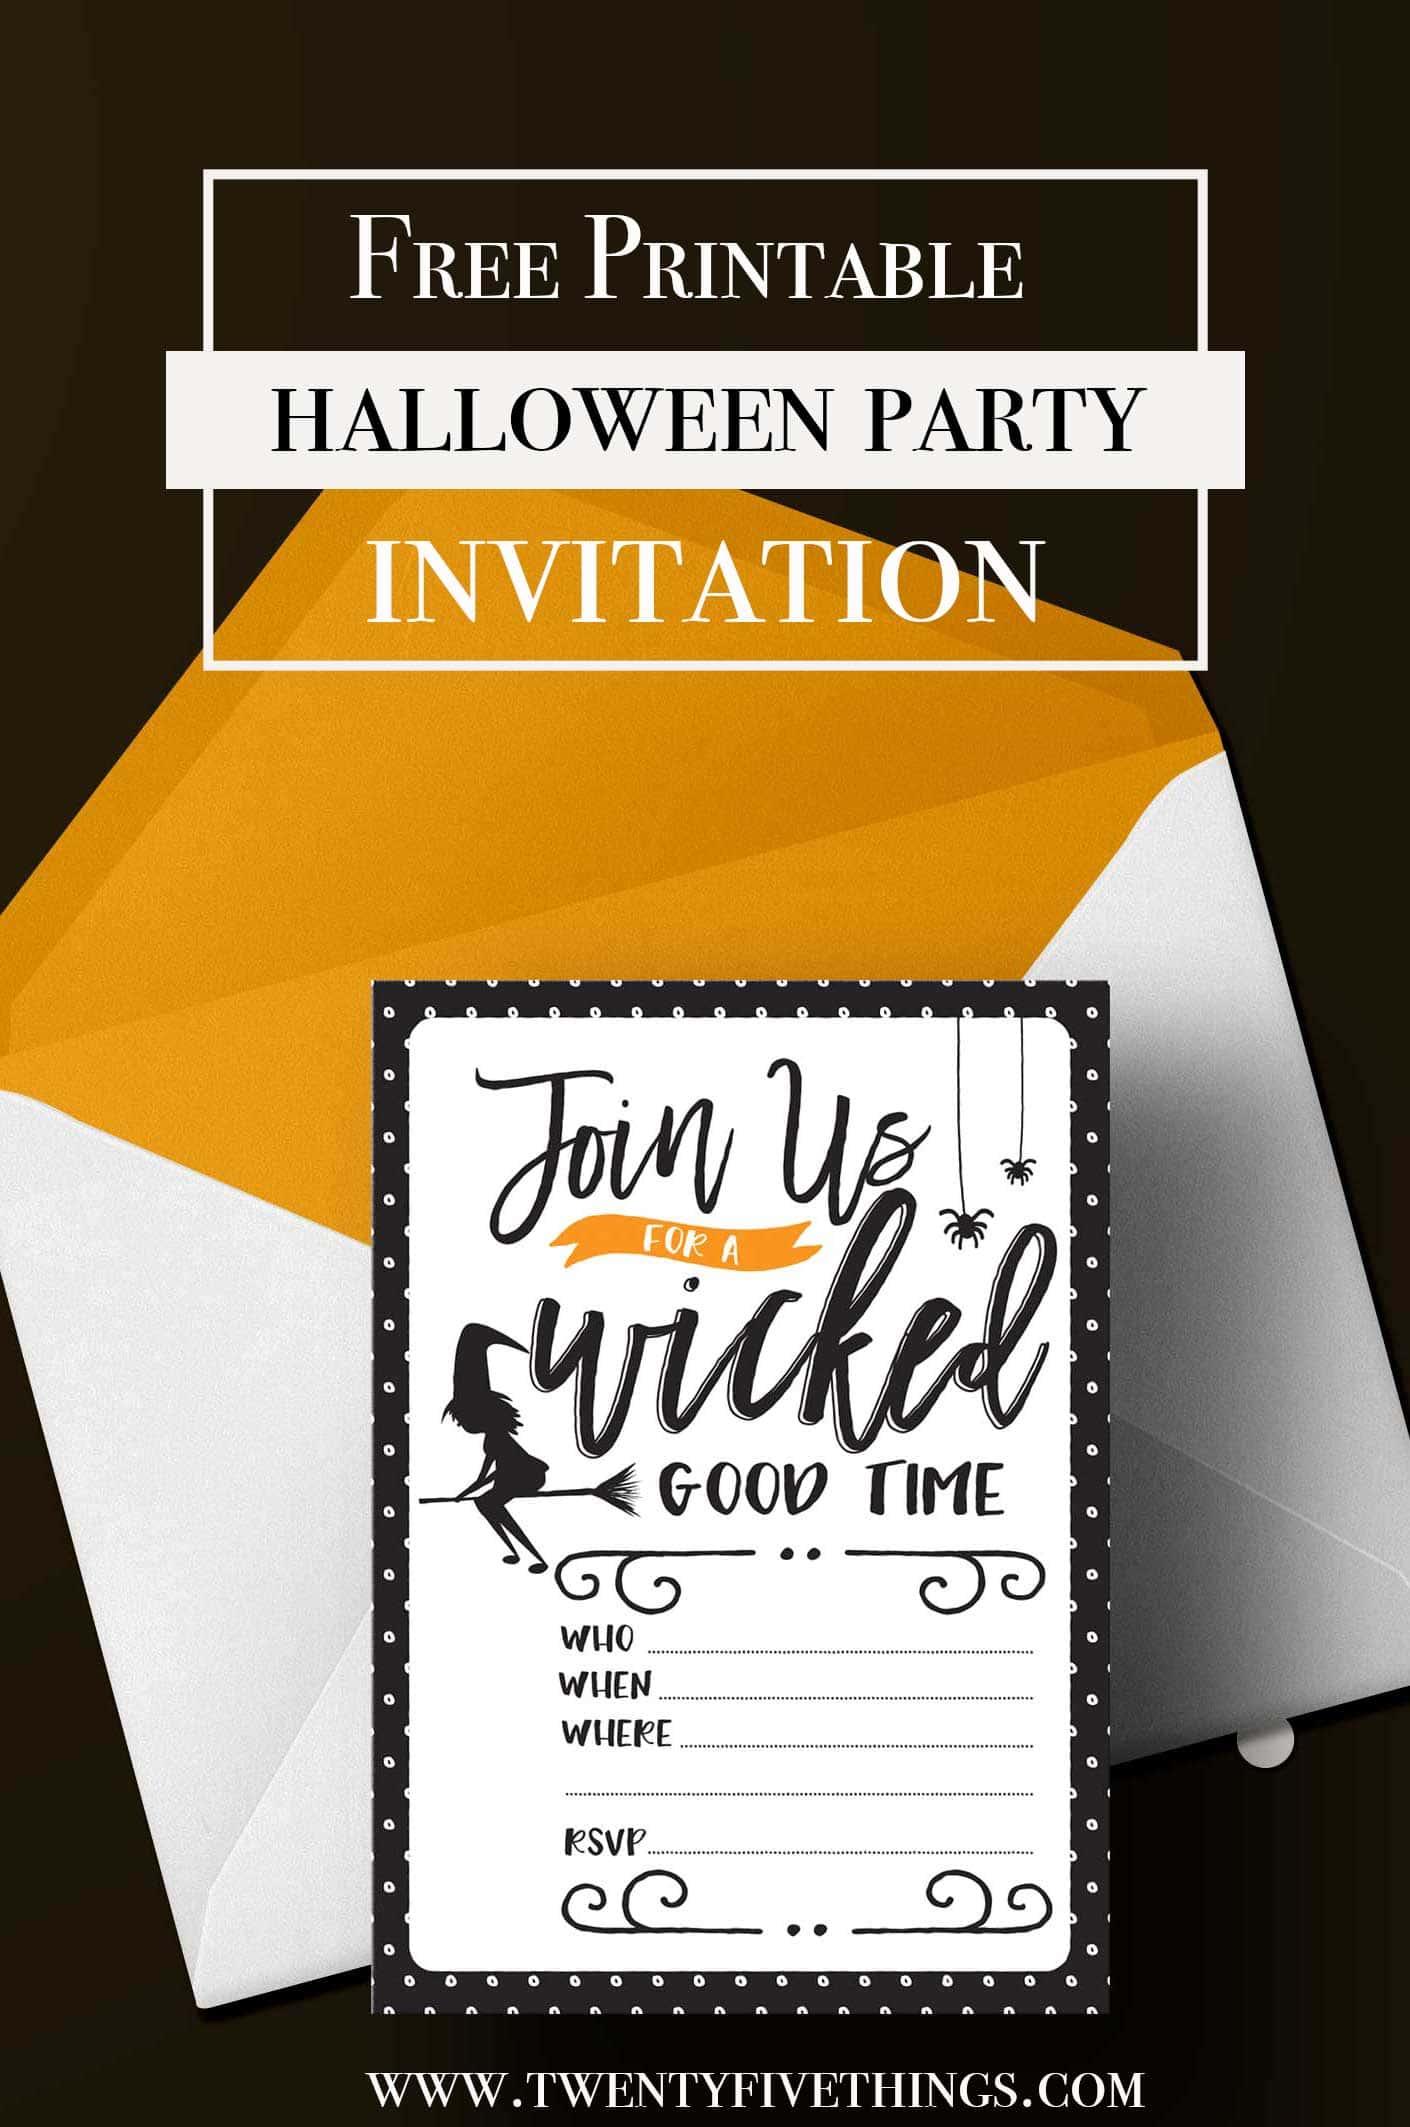 Cheap Party Invitations Bulk